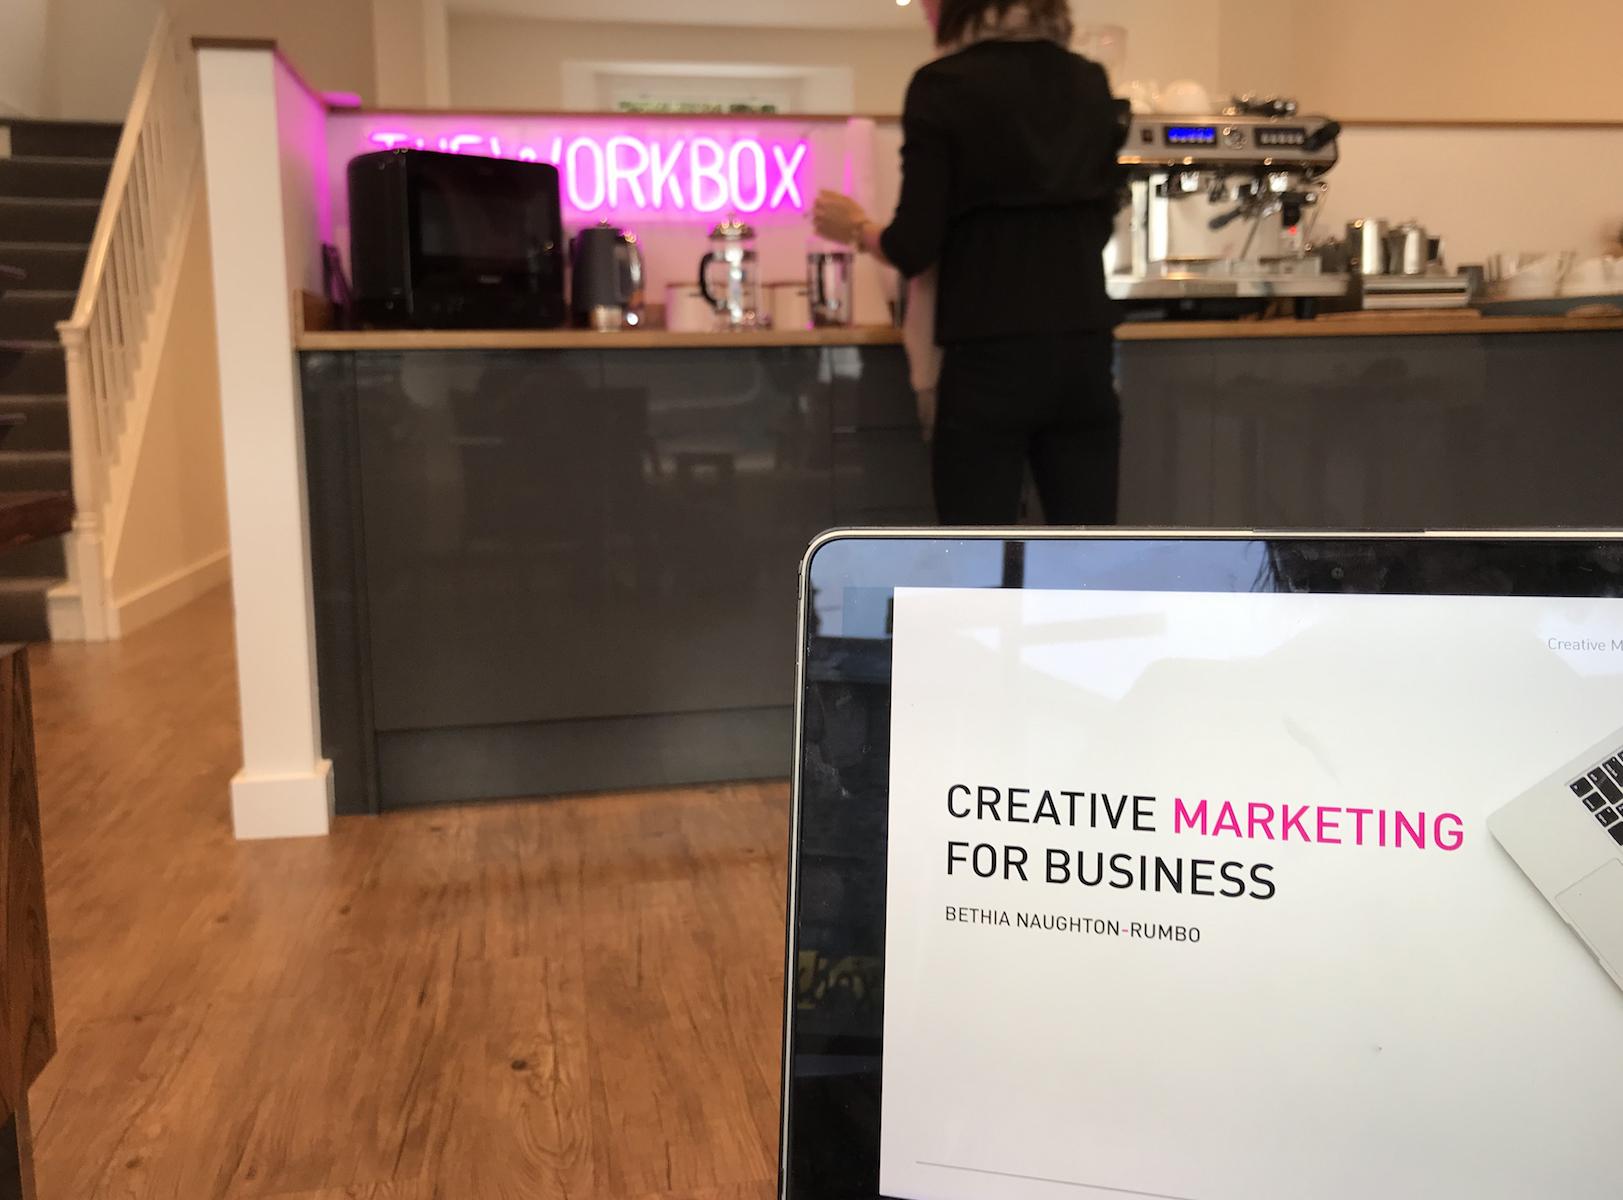 bethia-naughton-digital-marketing